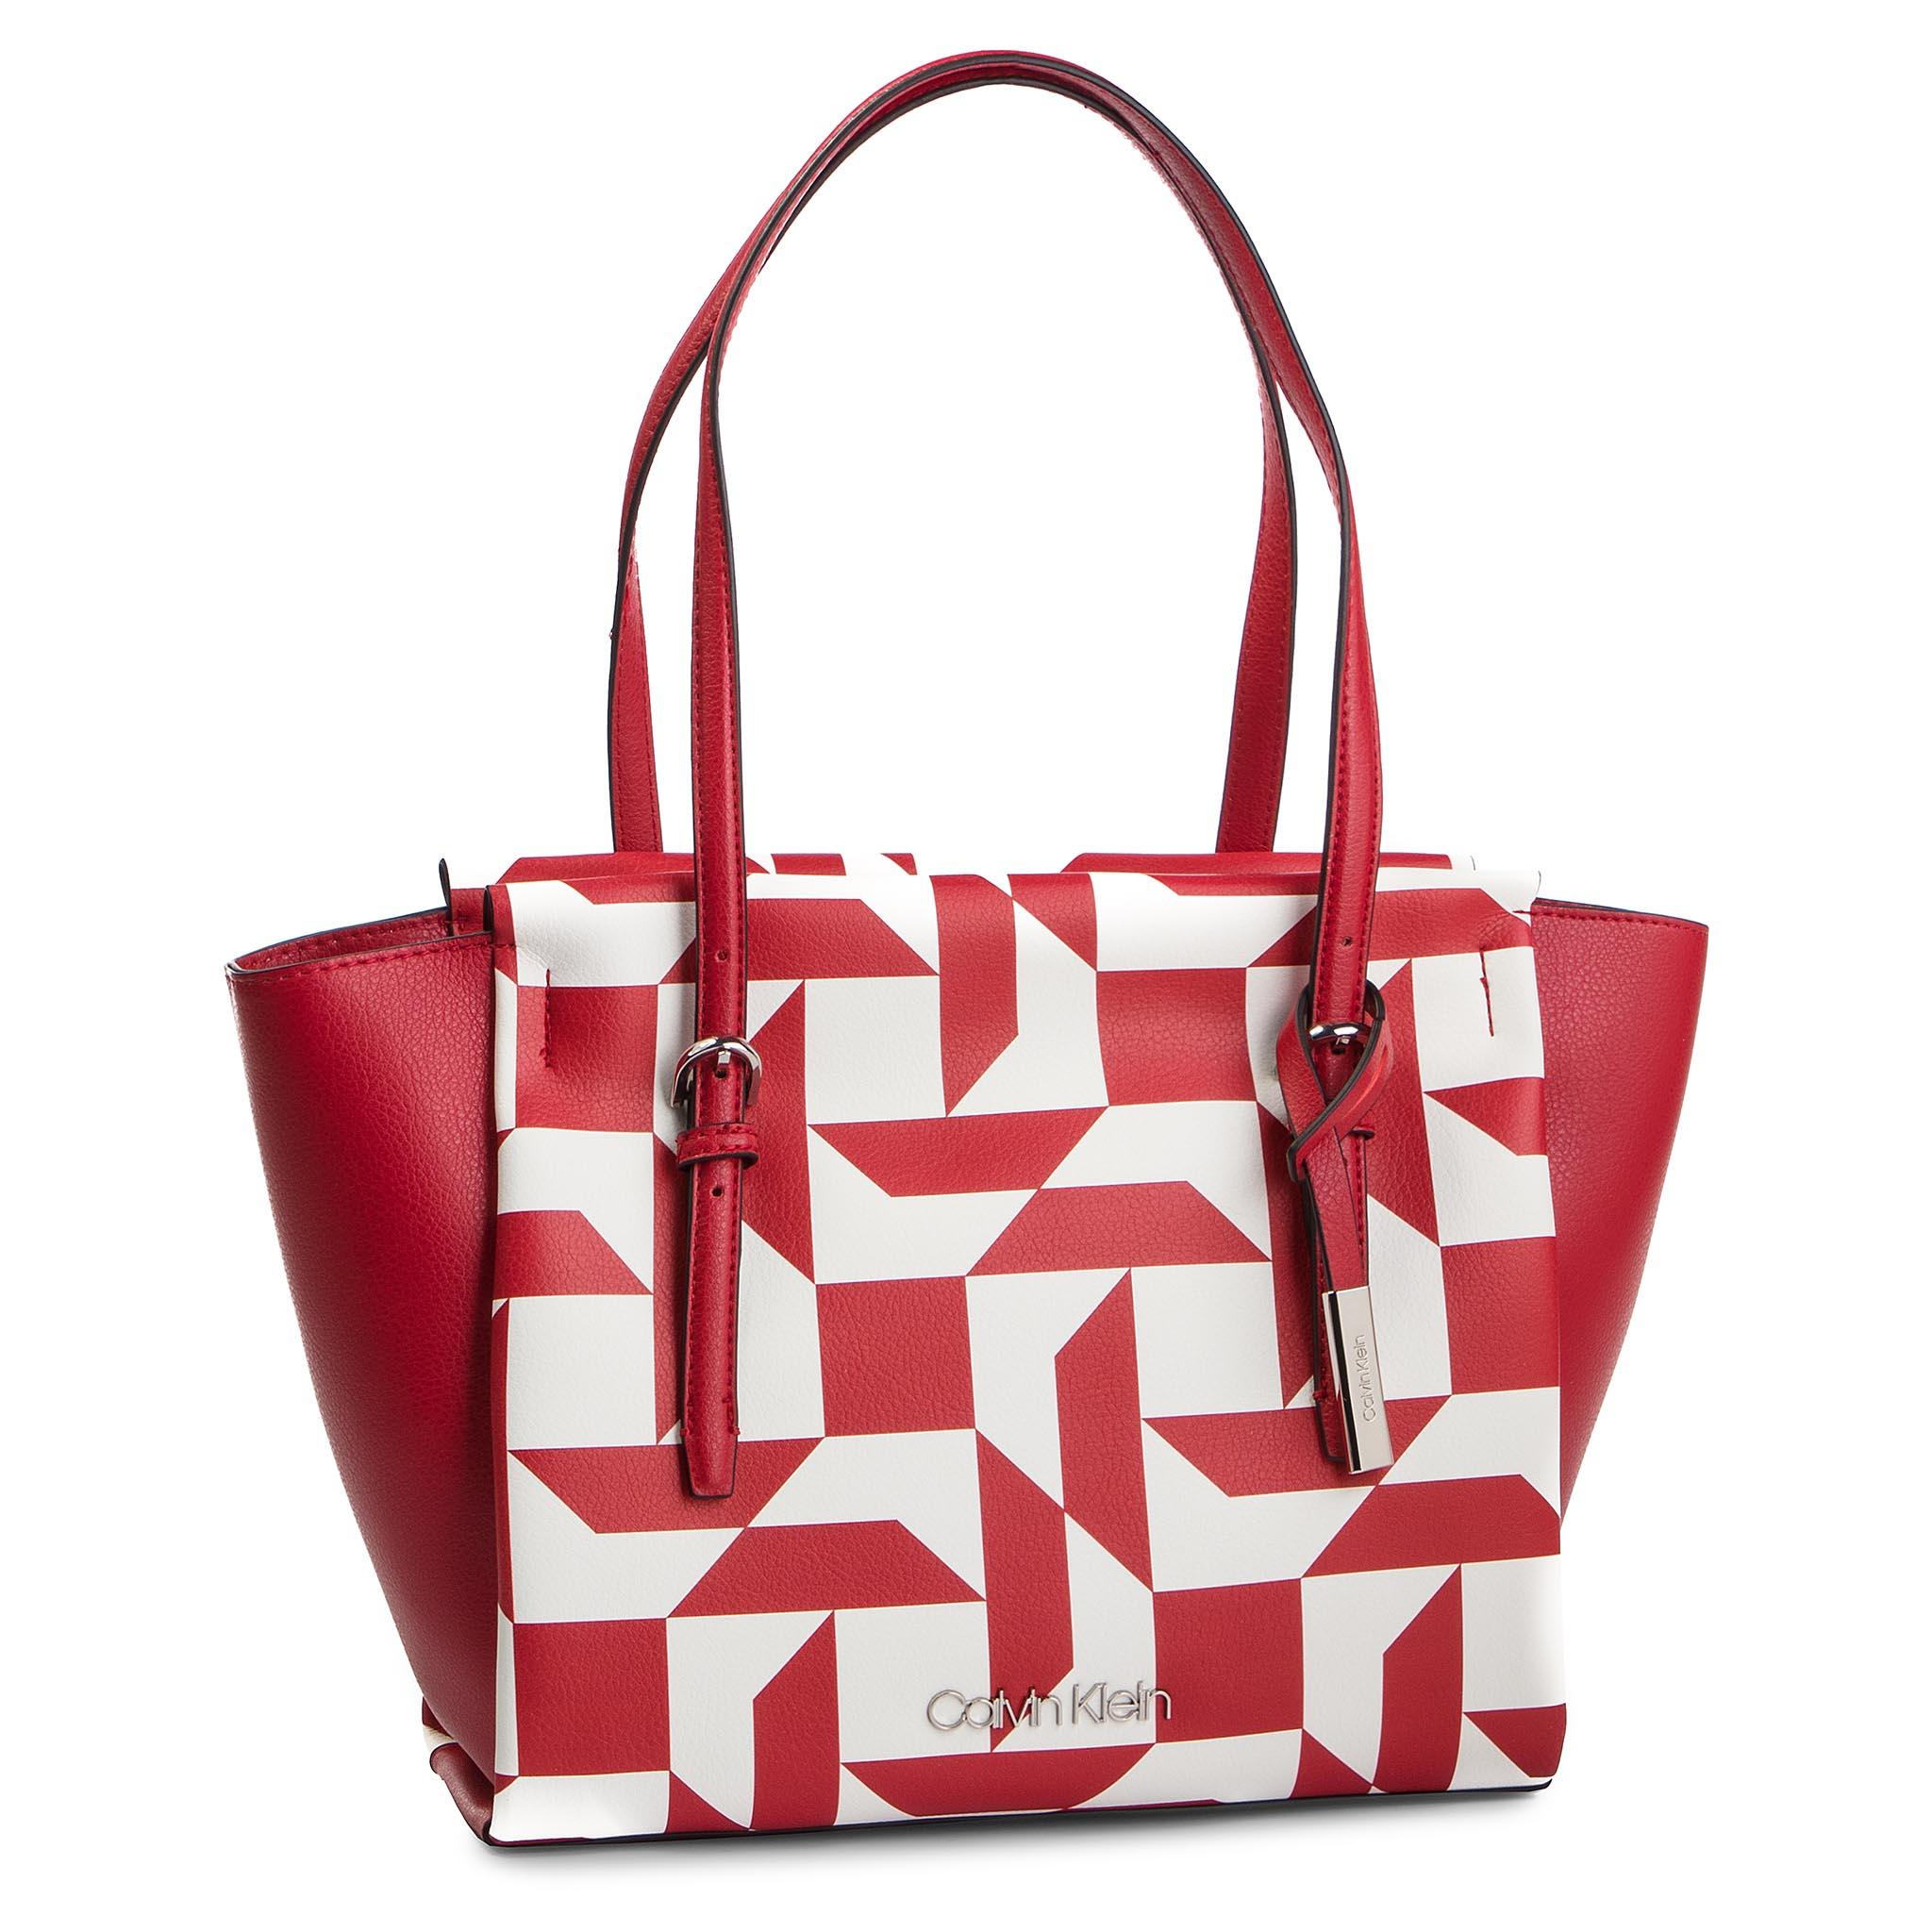 63deb15c9a0 Handbag CALVIN KLEIN - Monogram Duffle K60K605017 908 - Classic ...